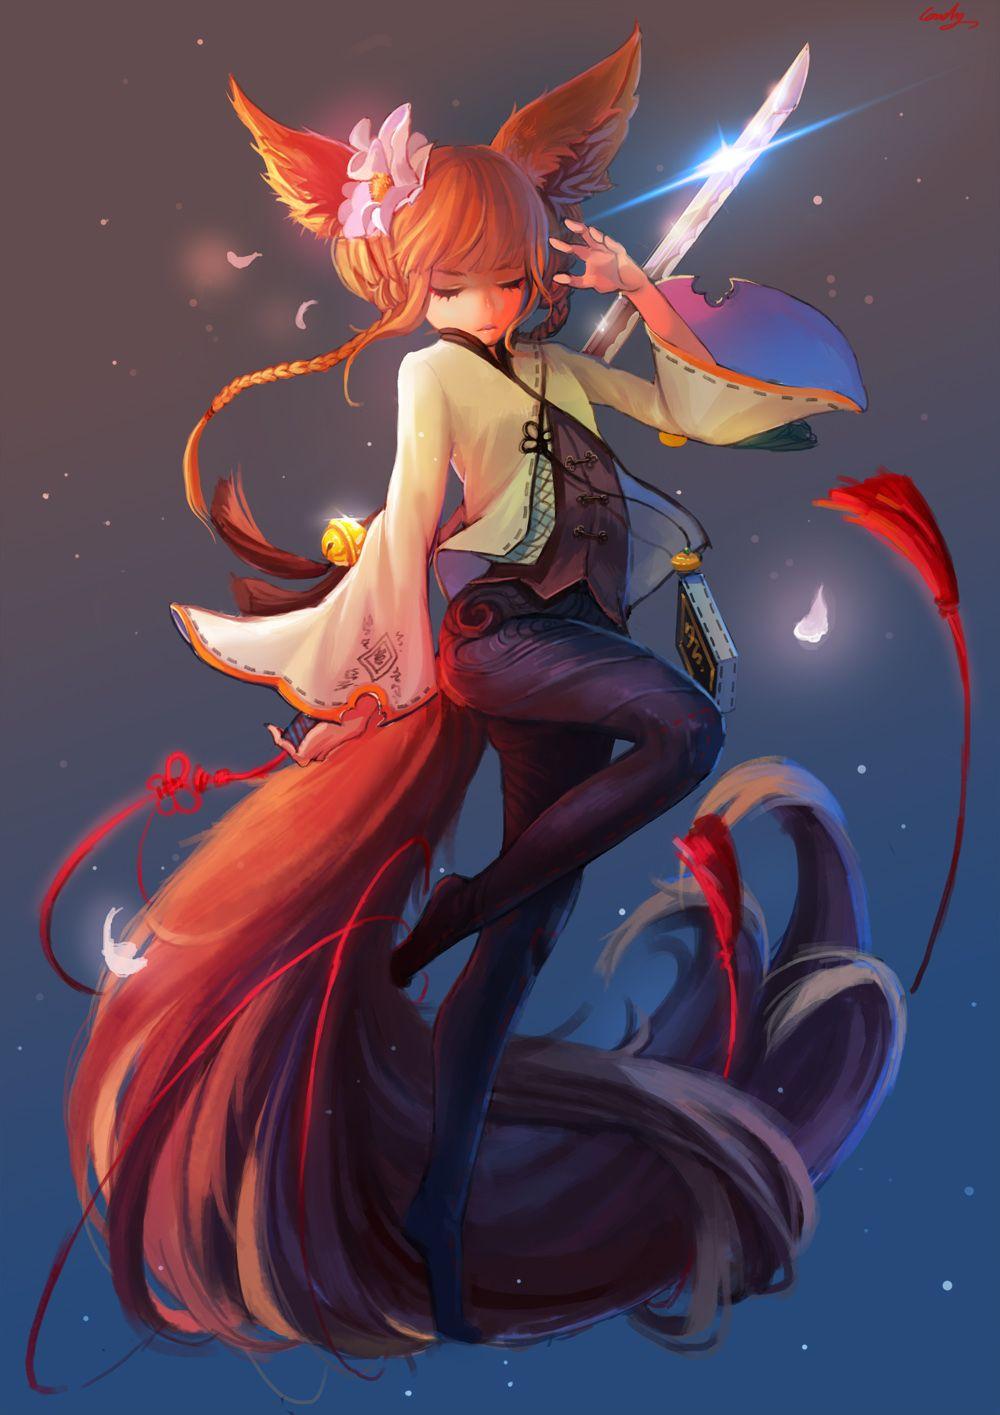 Race: Lyn Blade Dancer by Baoz | Blade and soul, Anime ...